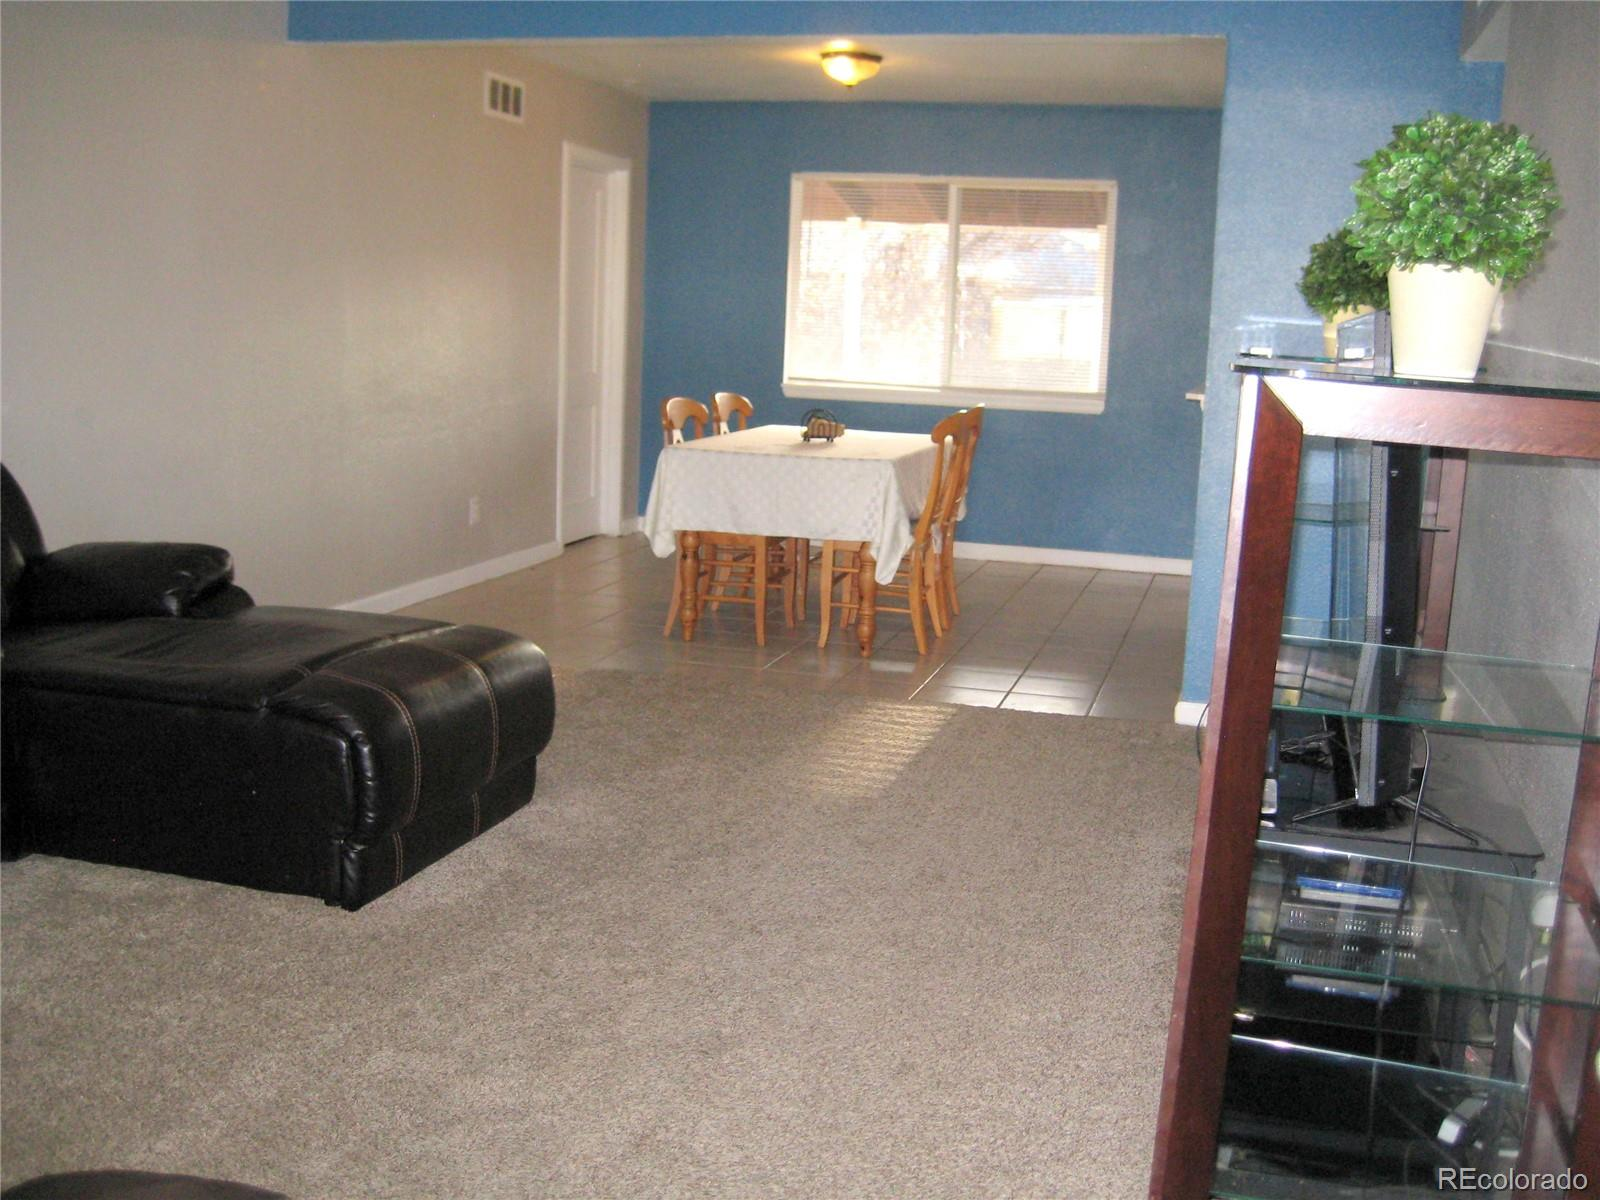 MLS# 8530466 - 9 - 957 Revere Street, Aurora, CO 80011